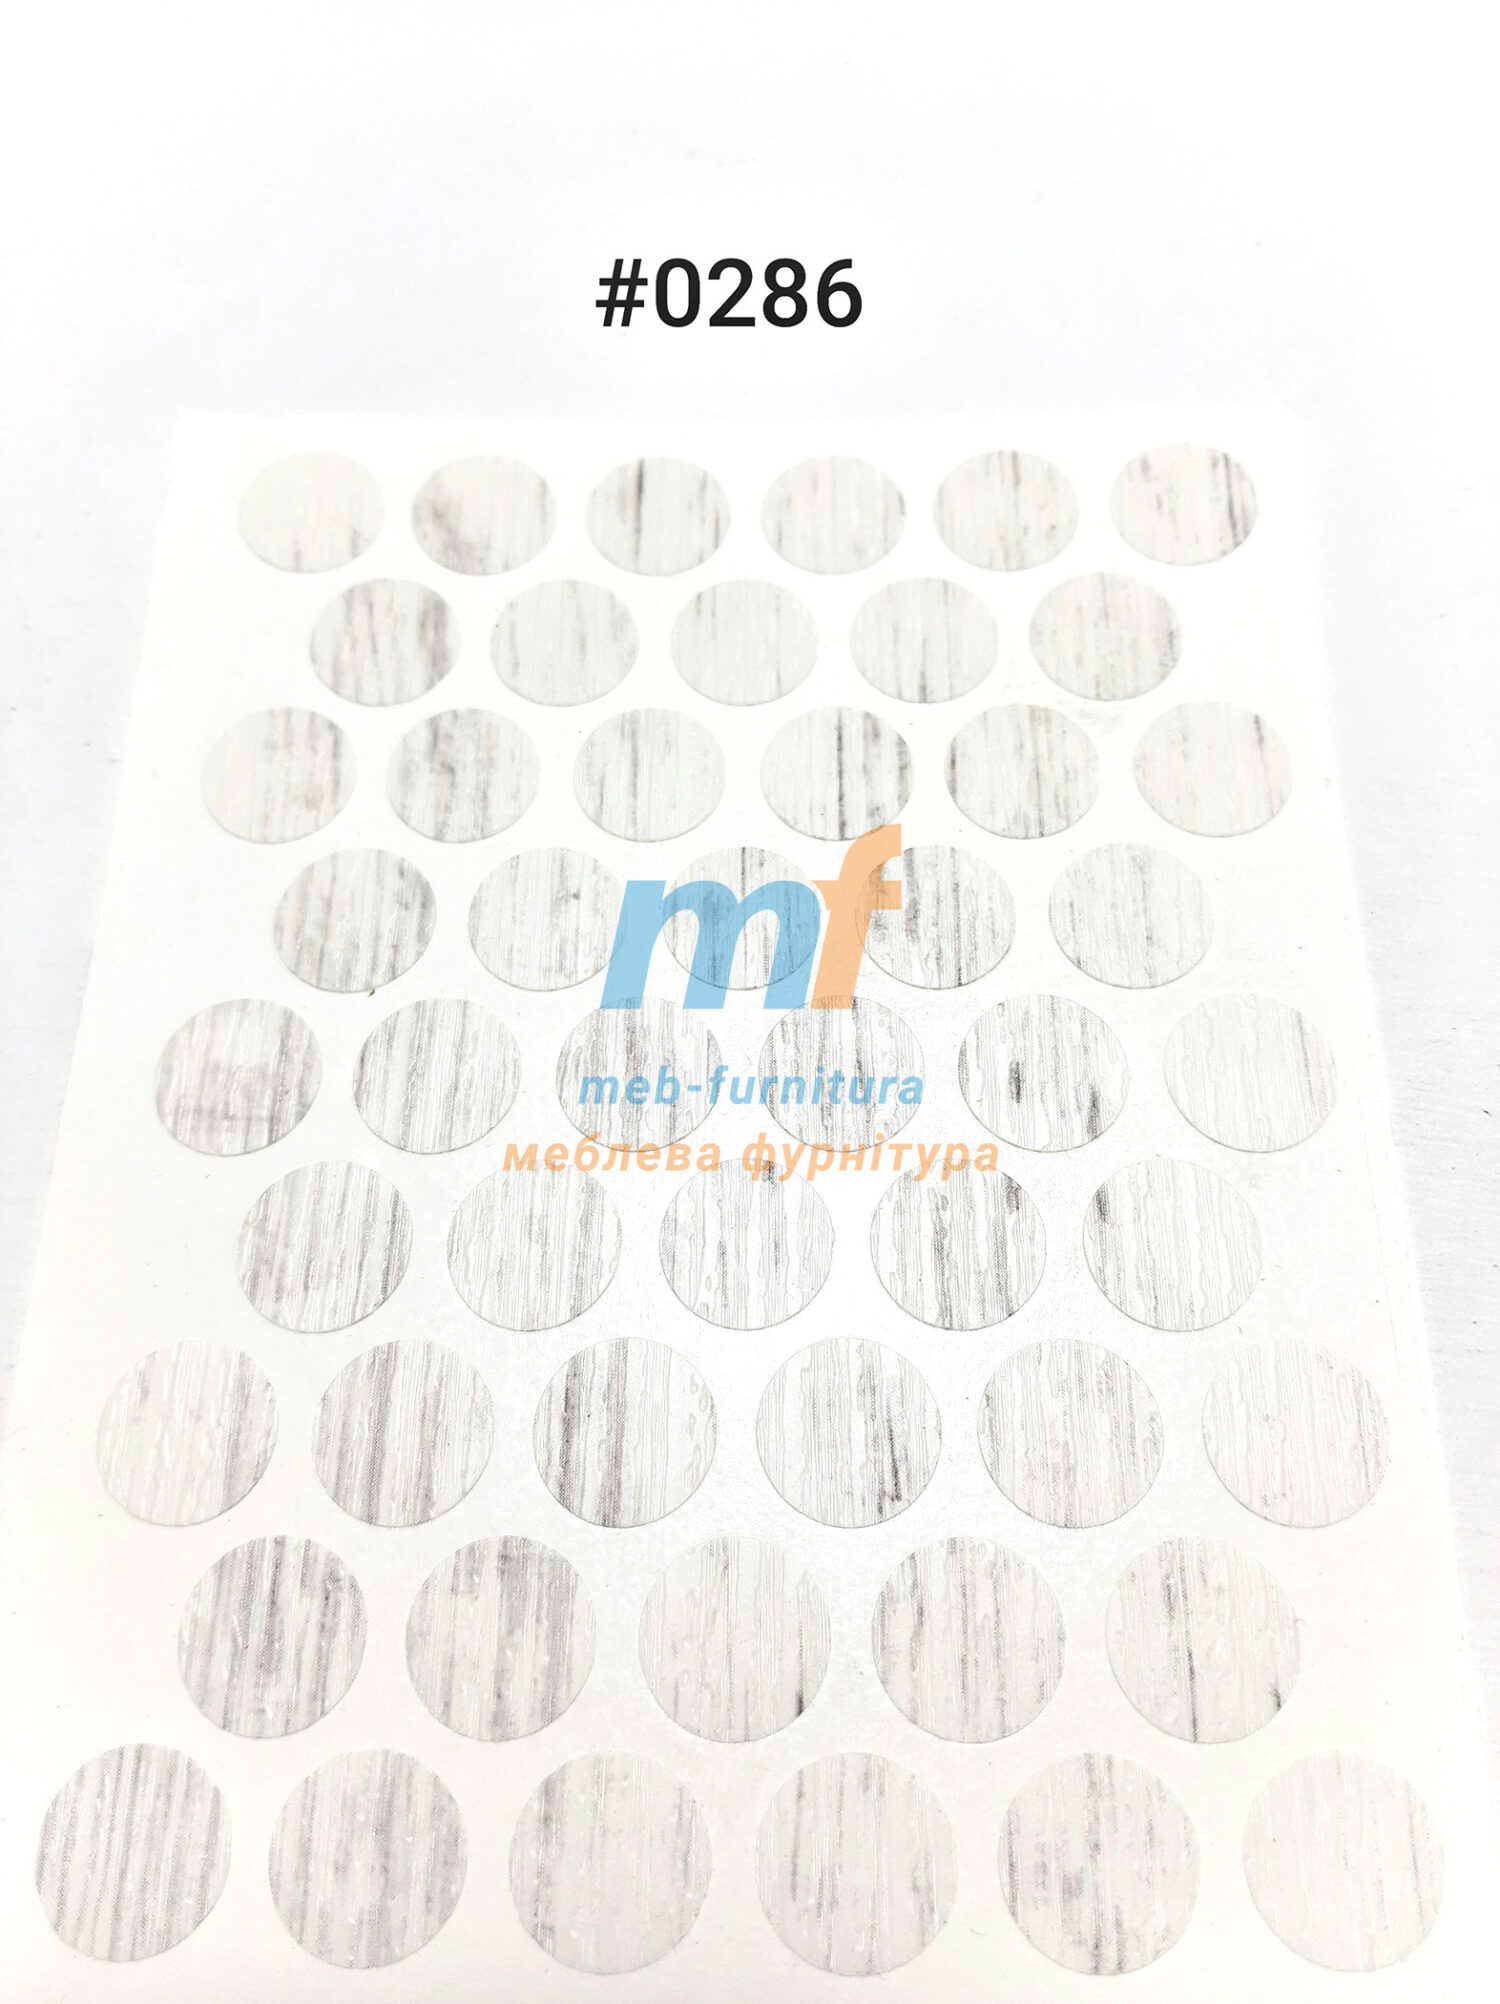 Заглушка на самоклейке для конфирмата,шурупа (0286)